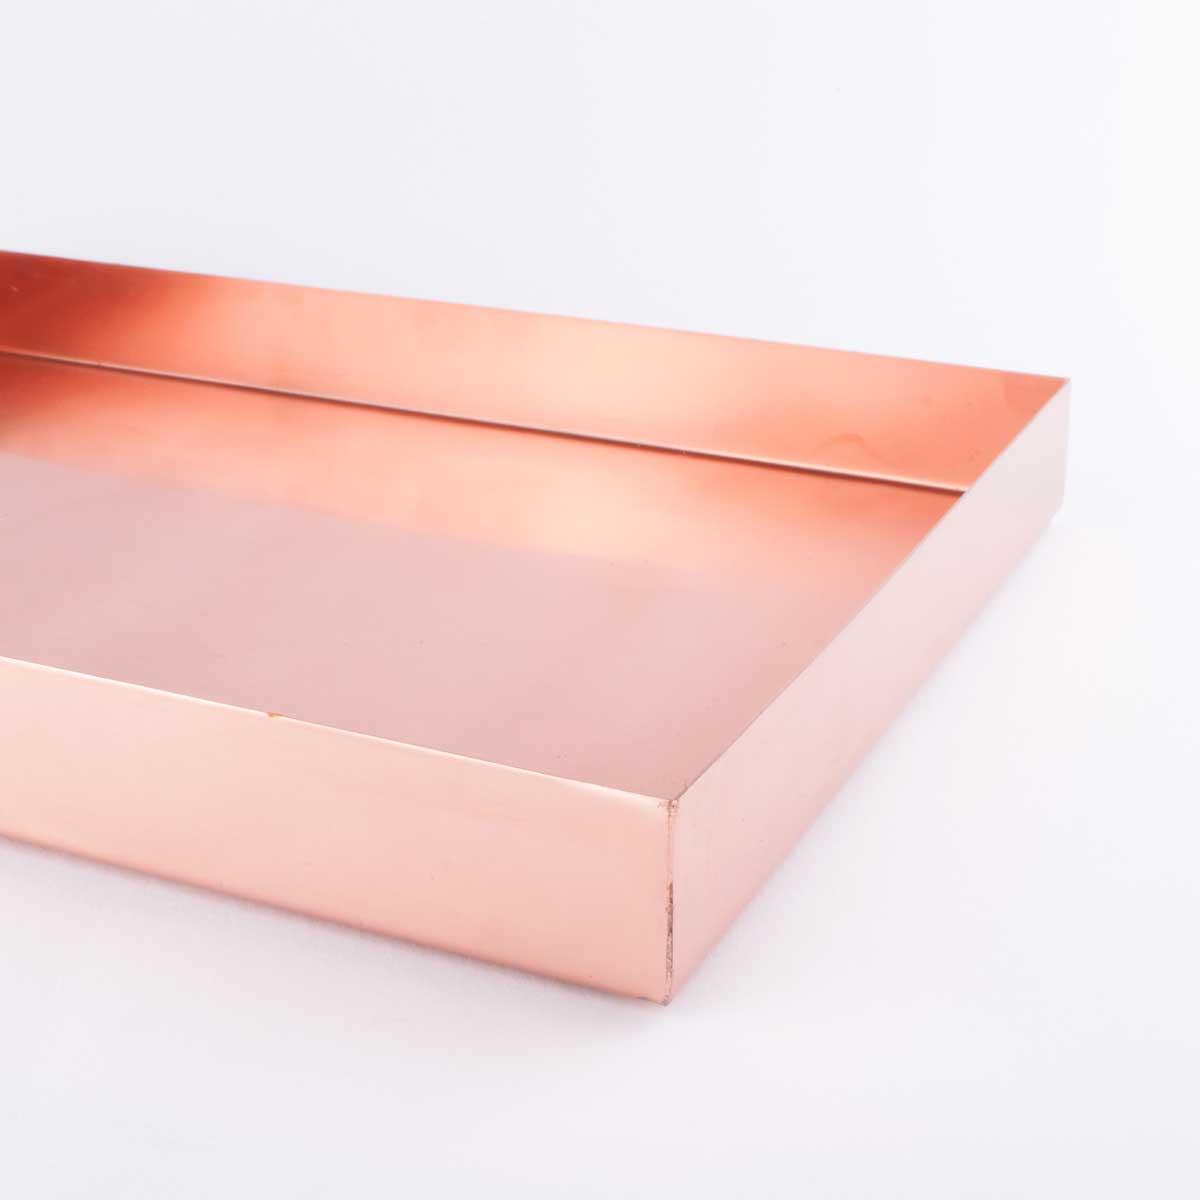 Copper Rectangular Tray